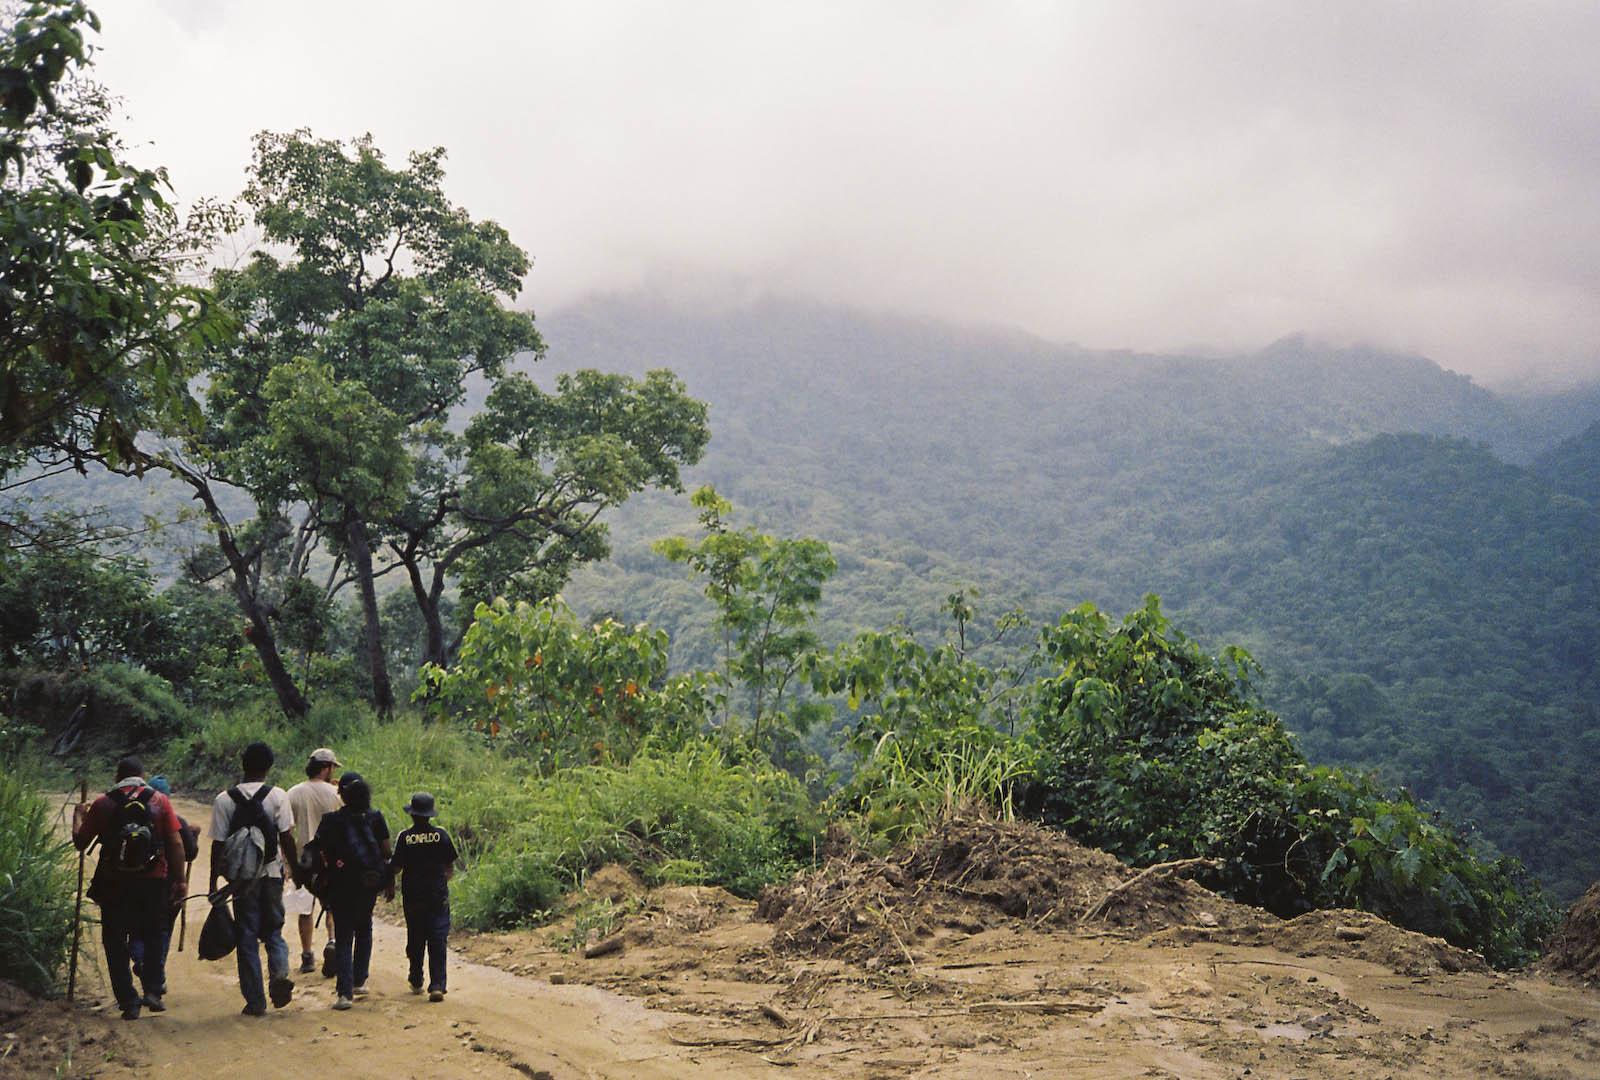 The Cool Colombian Sierra Nevadas